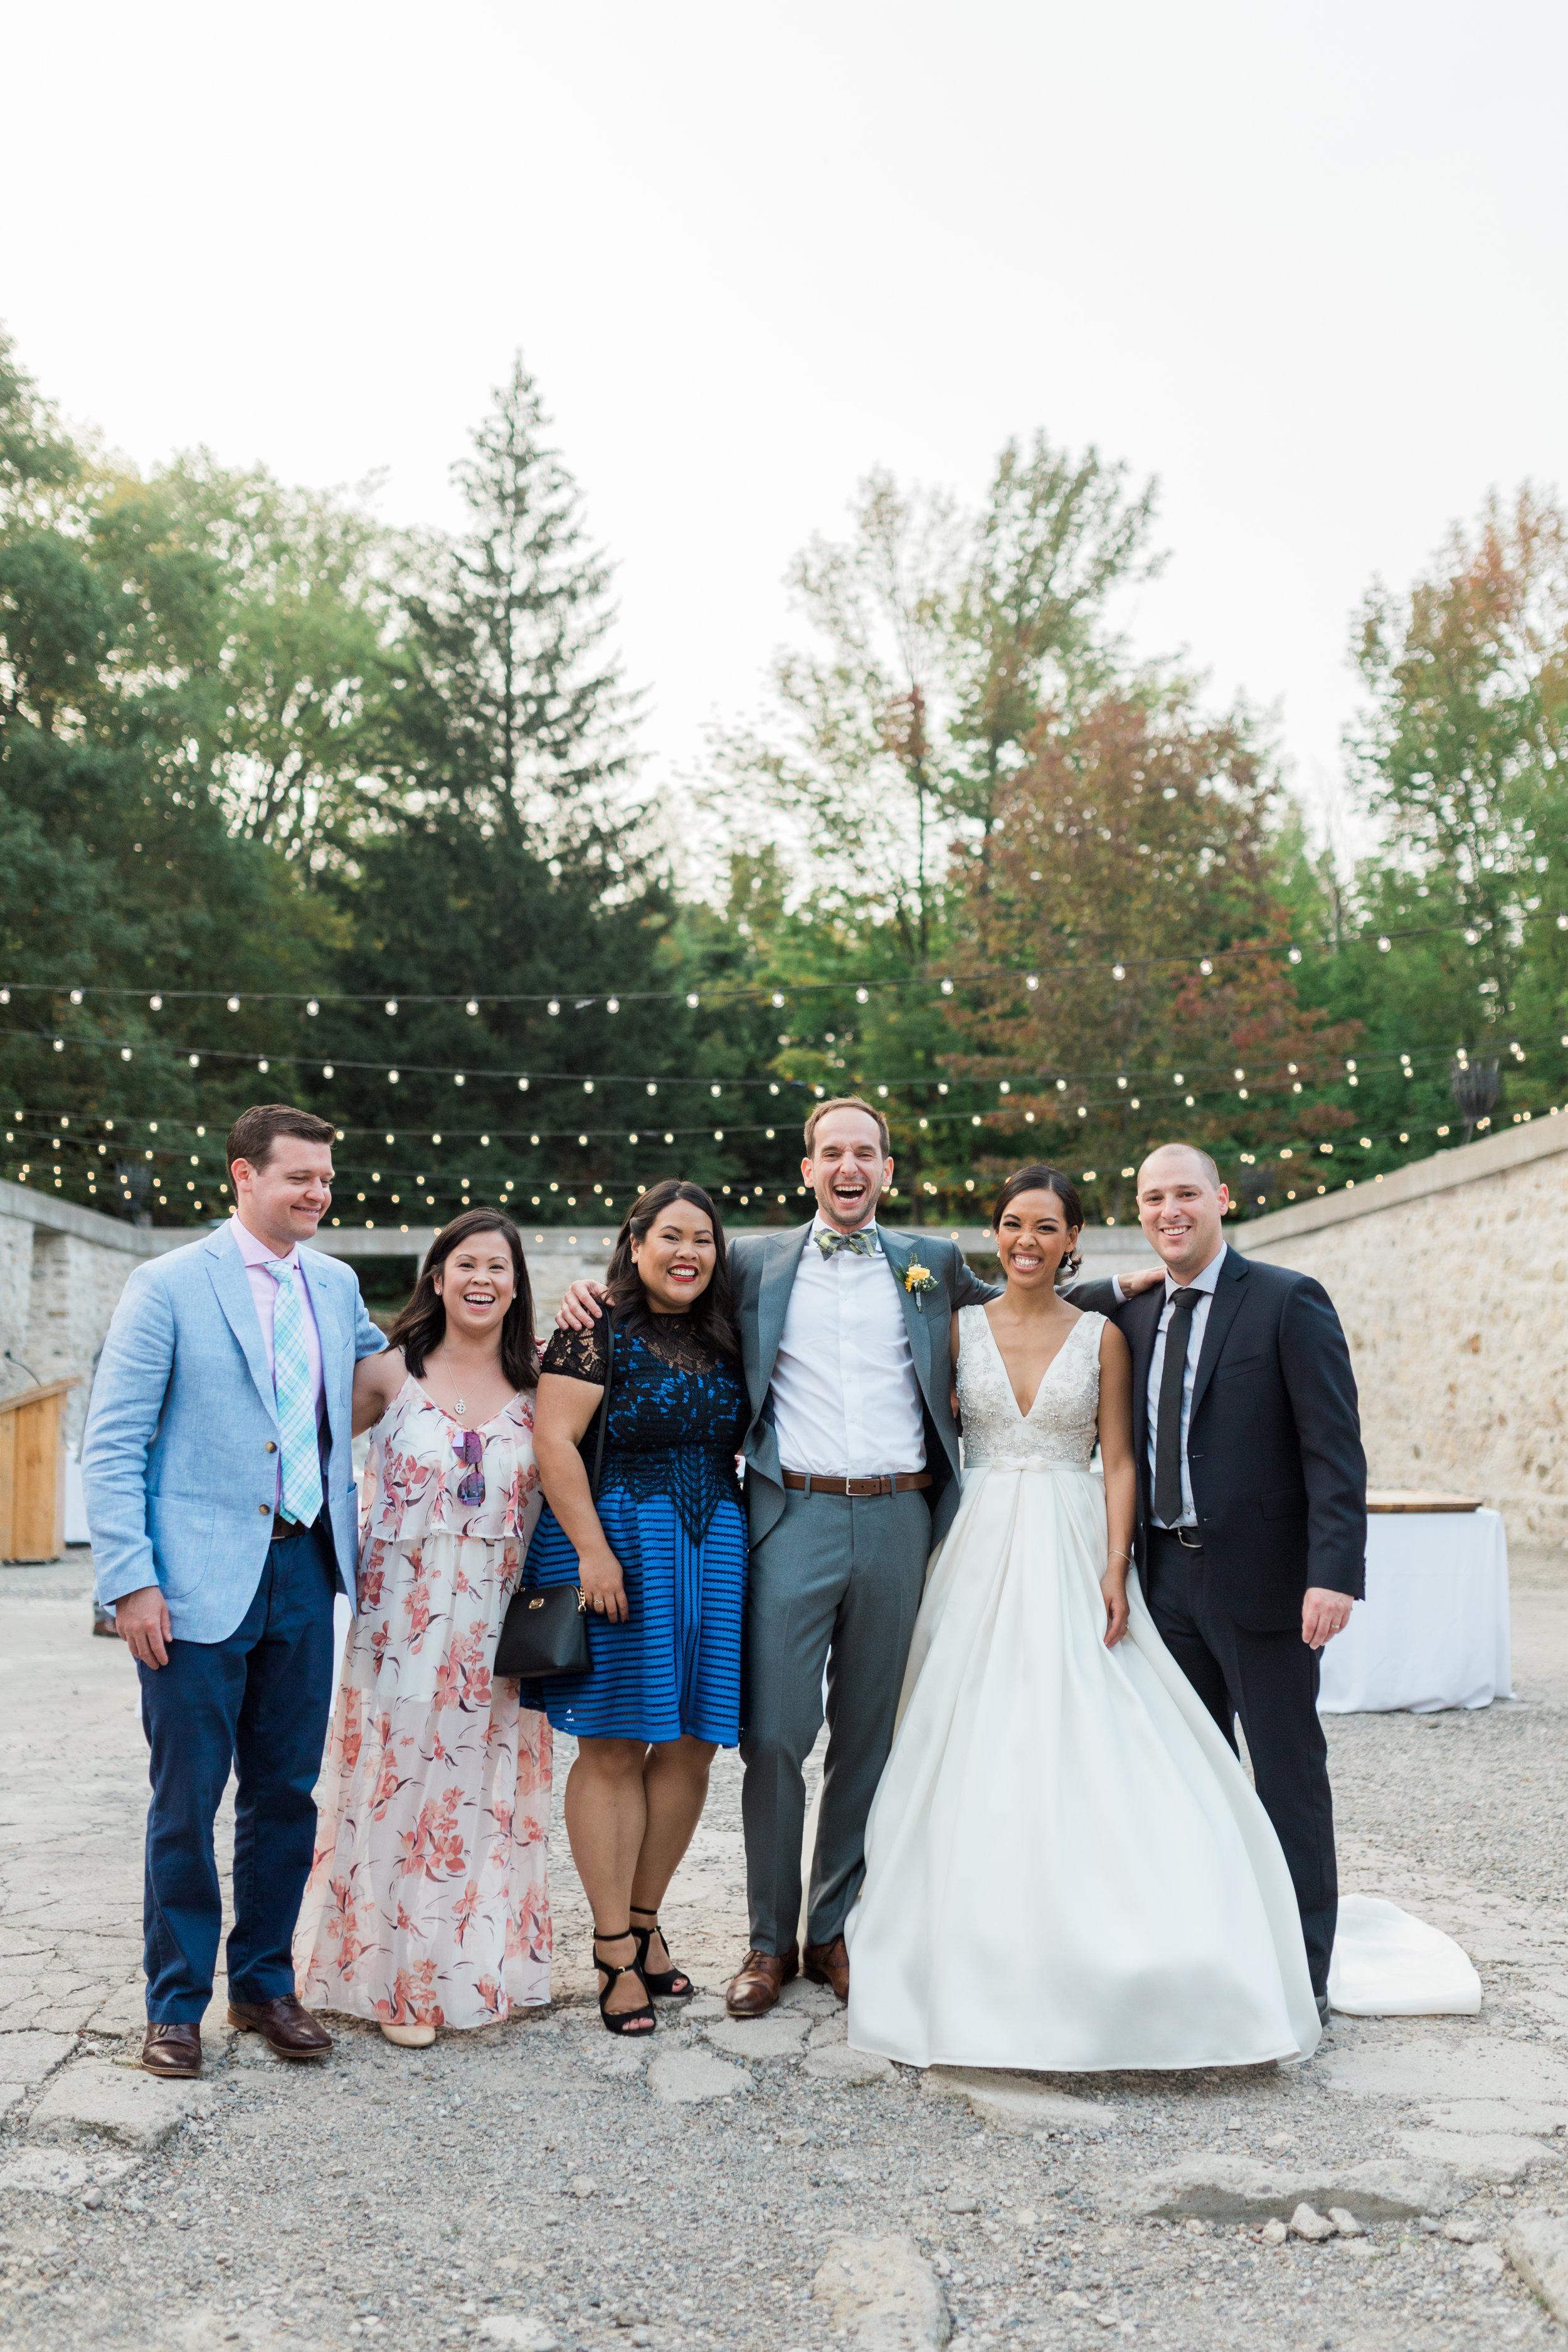 Alton Mills Wedding - Reception-24.jpg